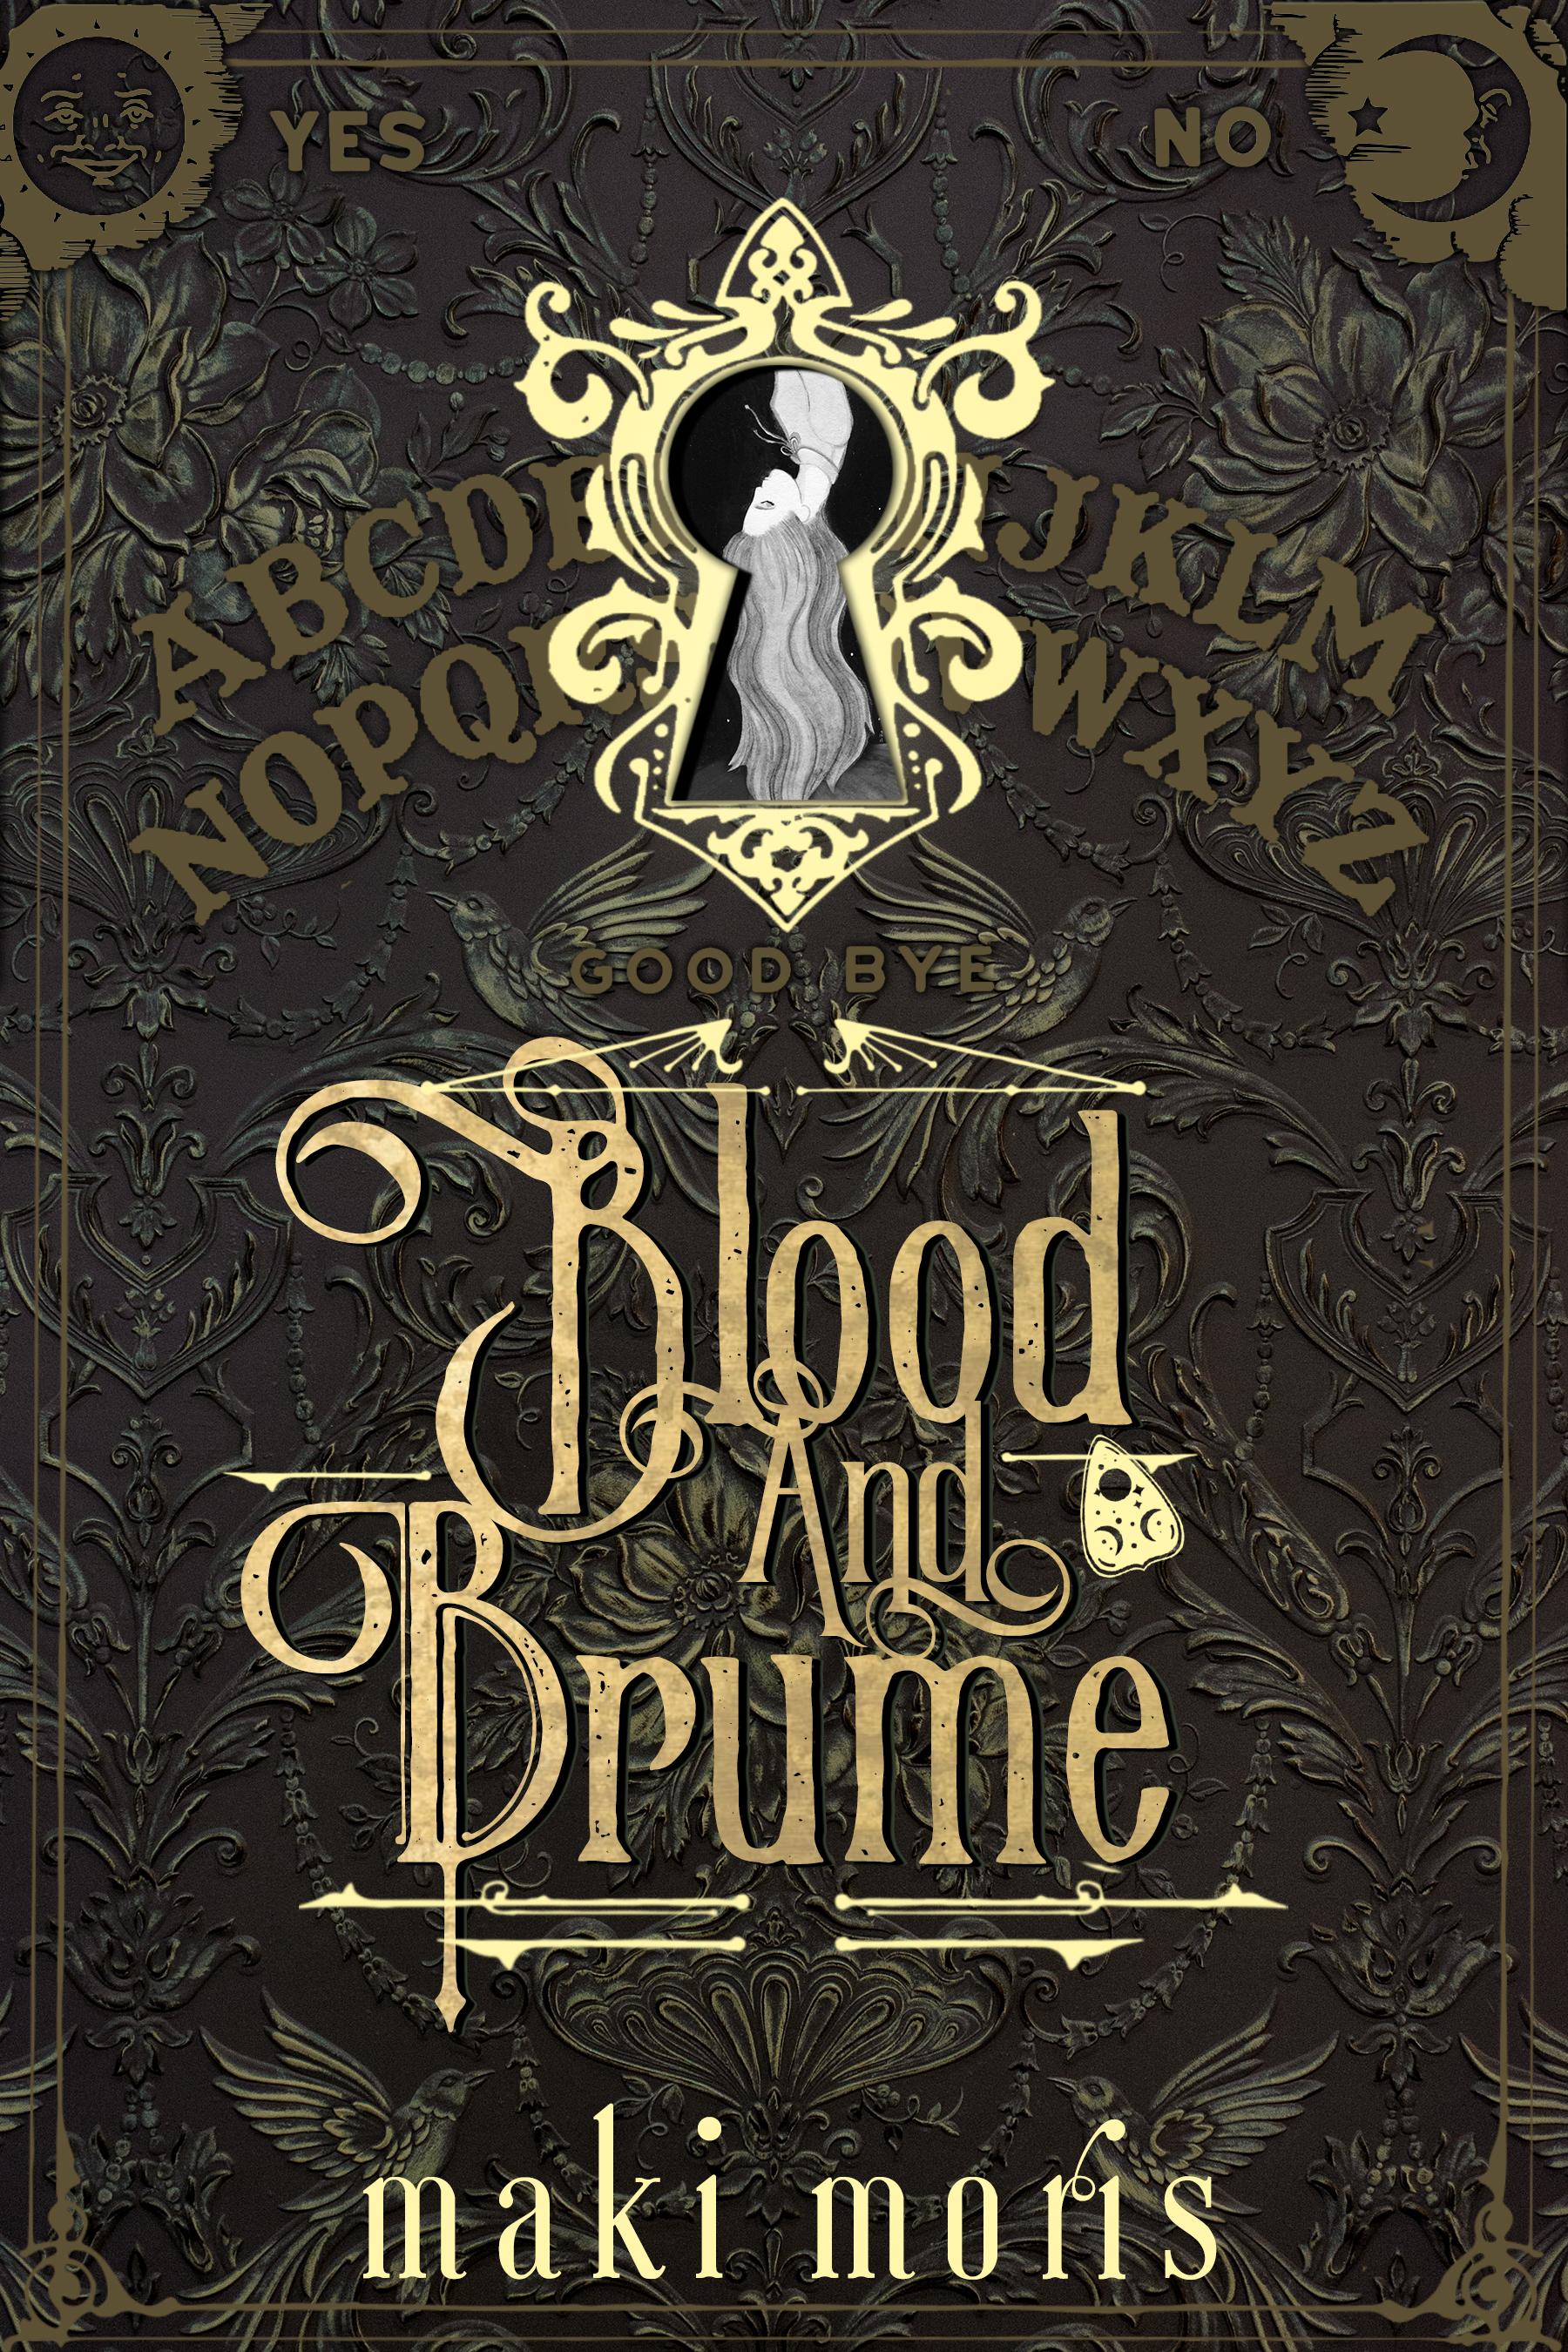 Blood and Brume - maki morris